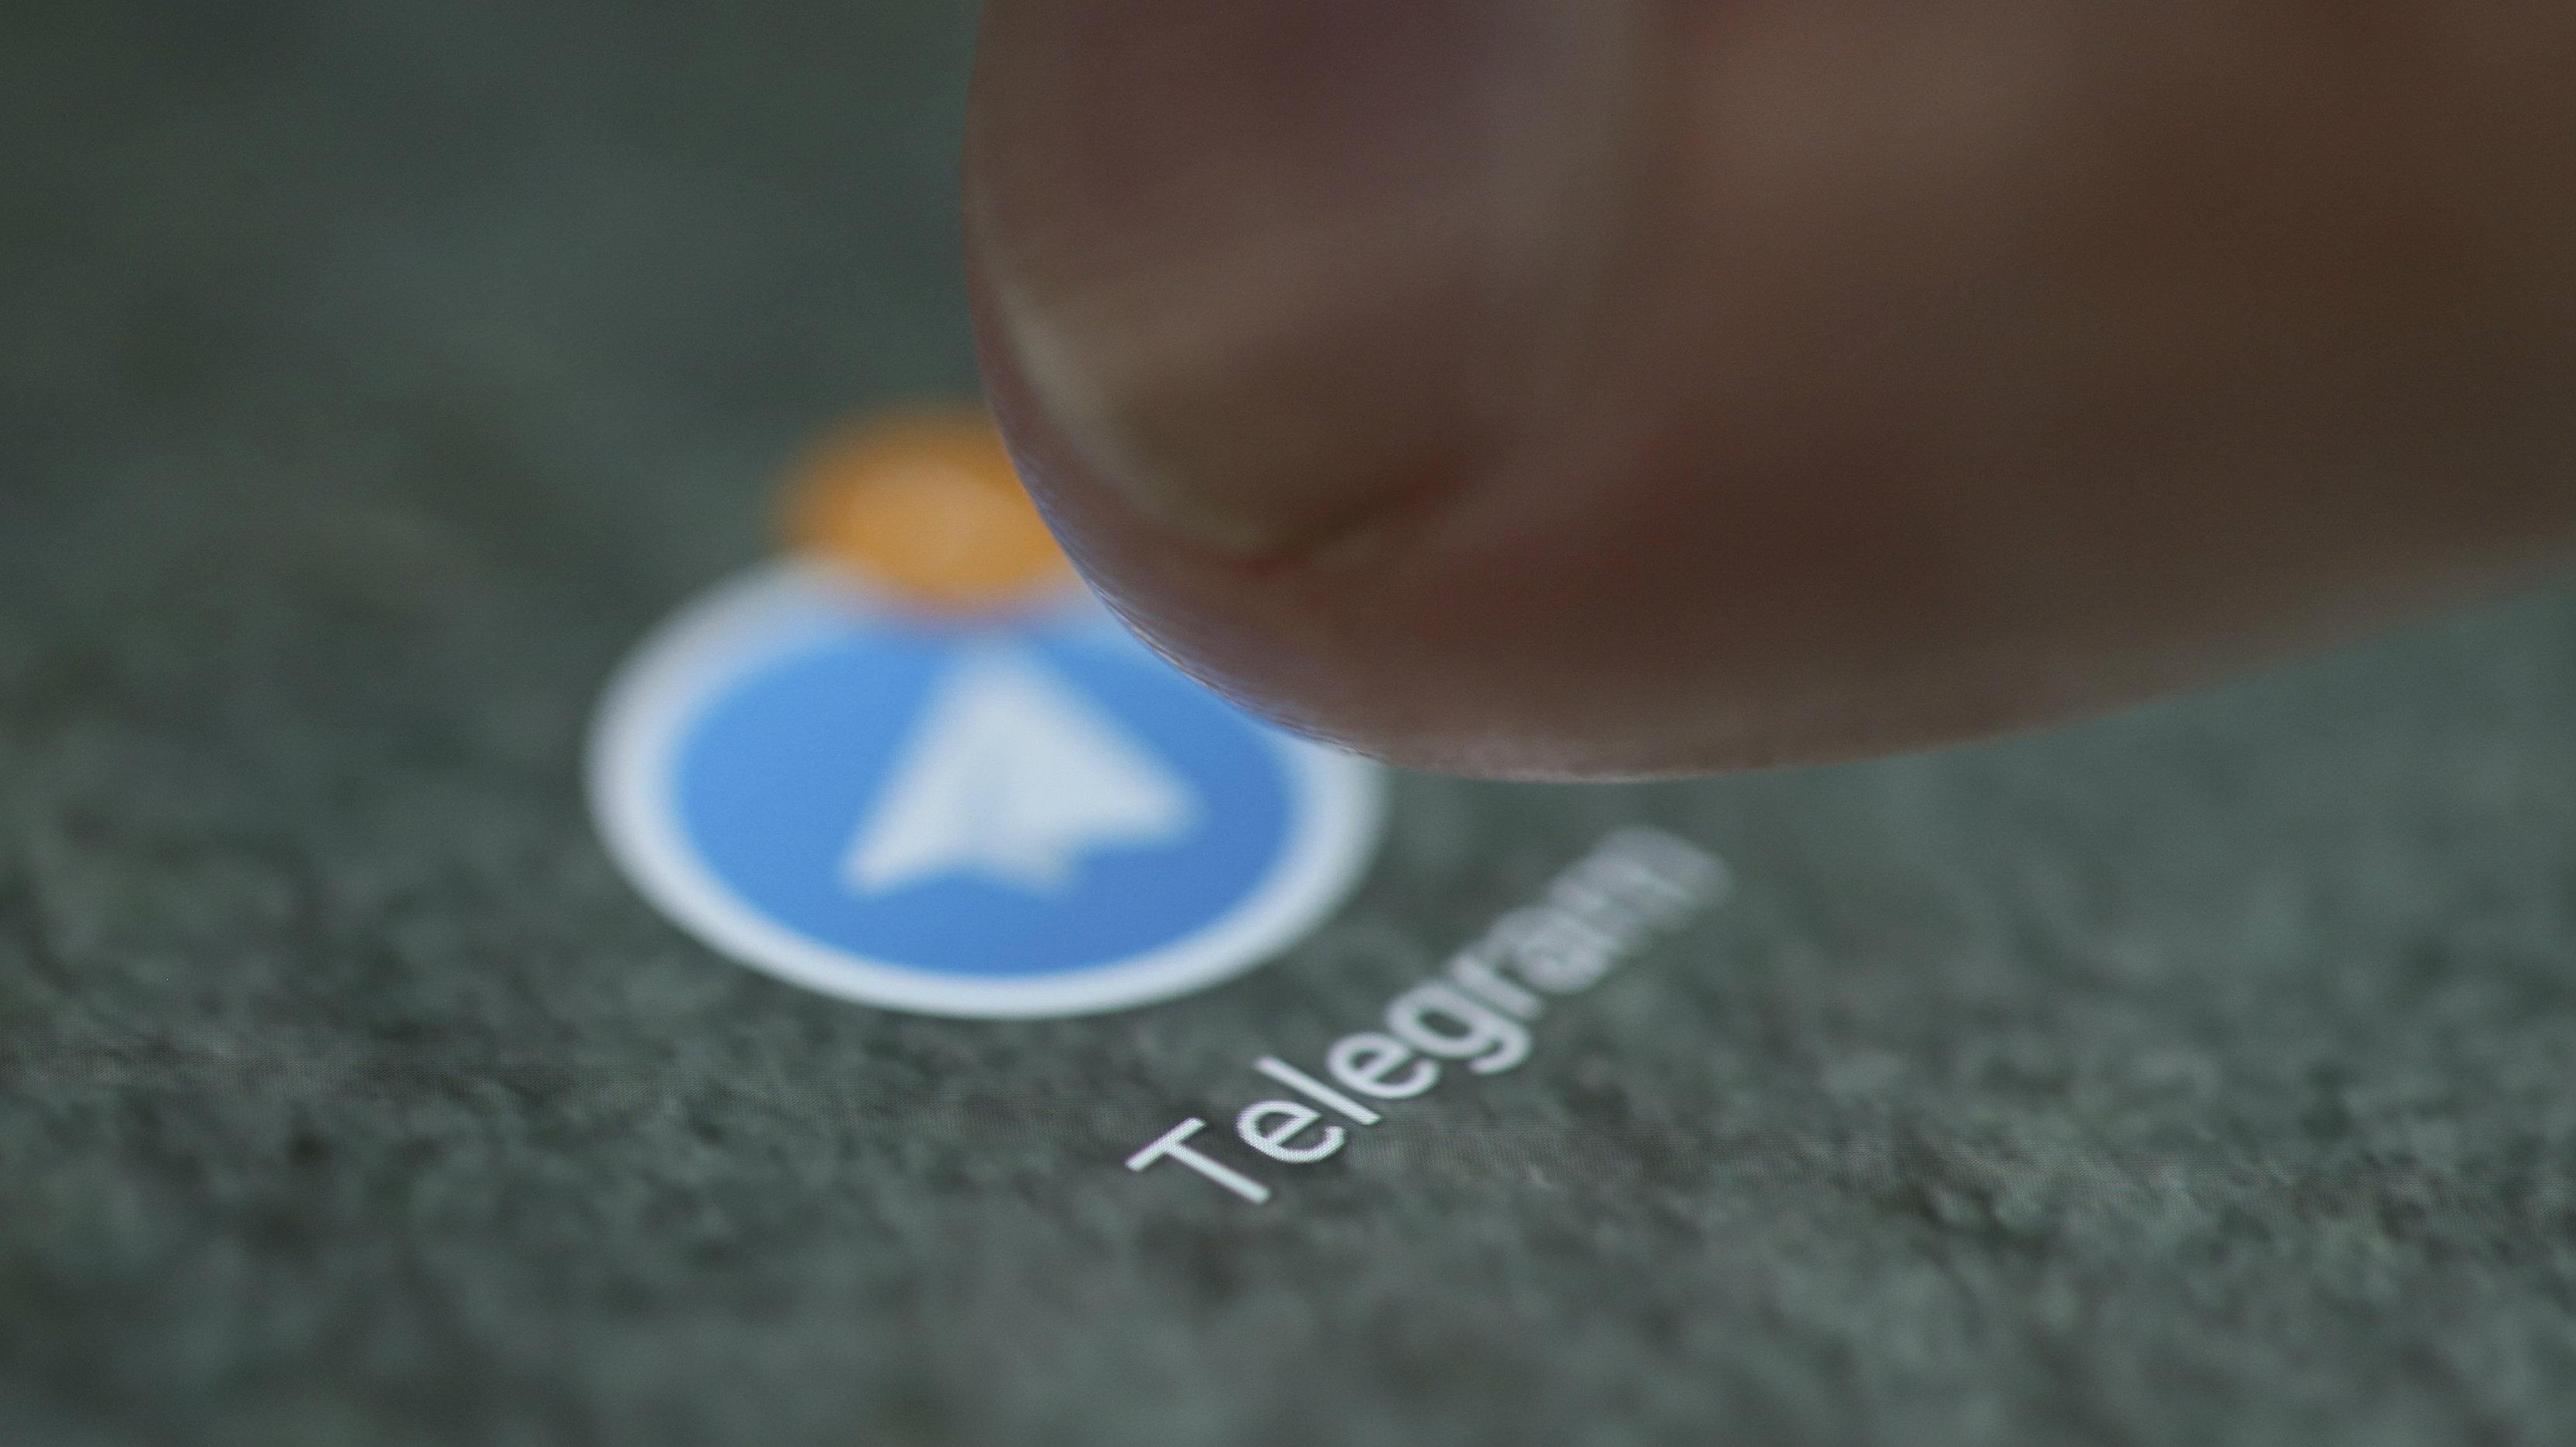 c telegram RTX5NXYJ Dado Ruvic